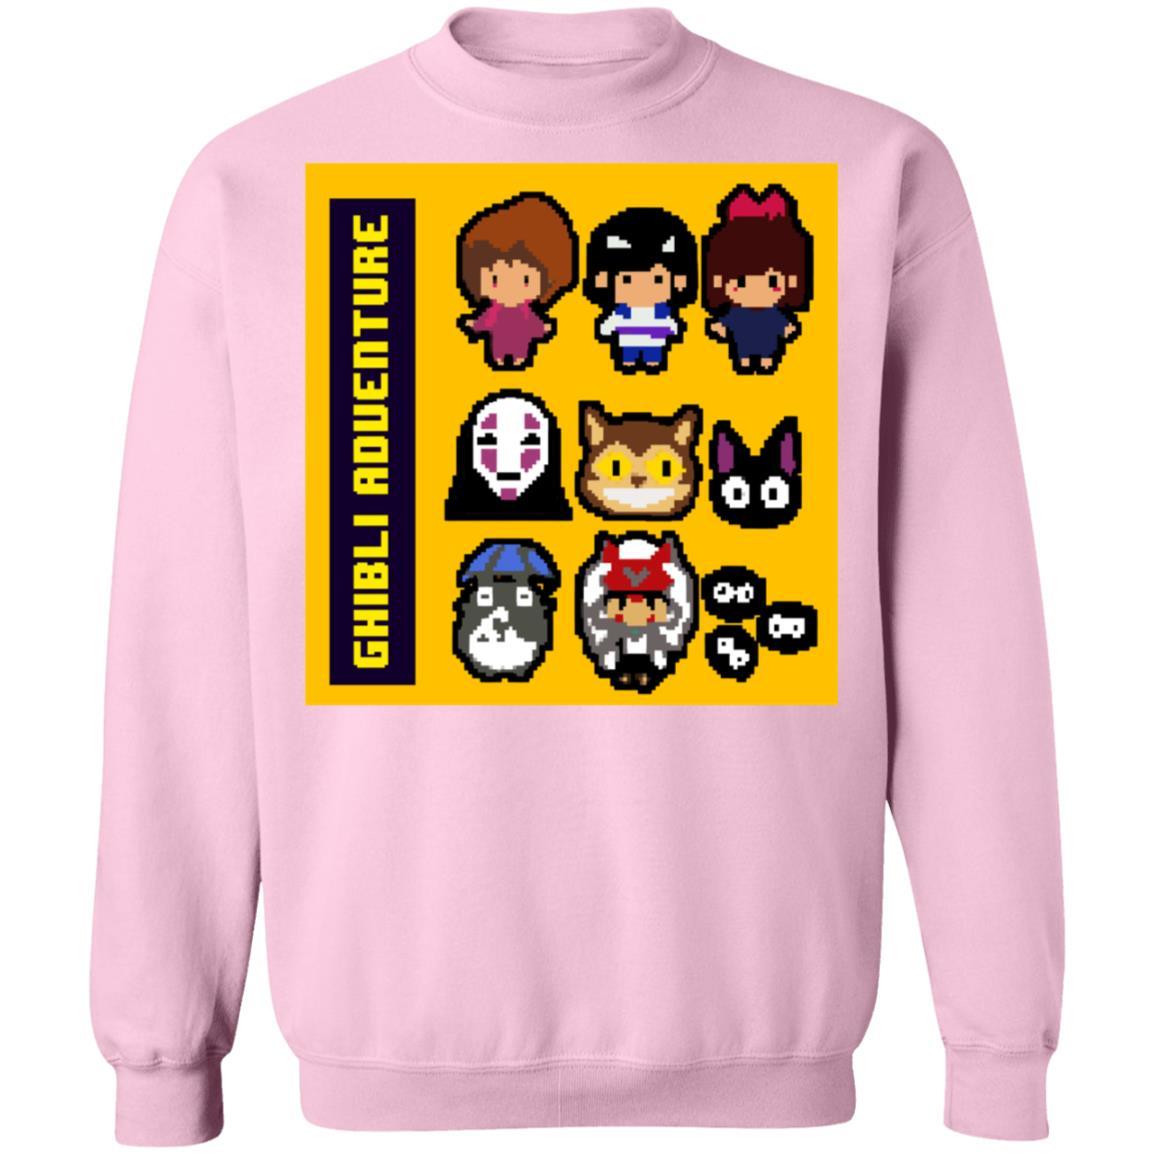 8 BIT Ghibli Adventures Sweatshirt Unisex